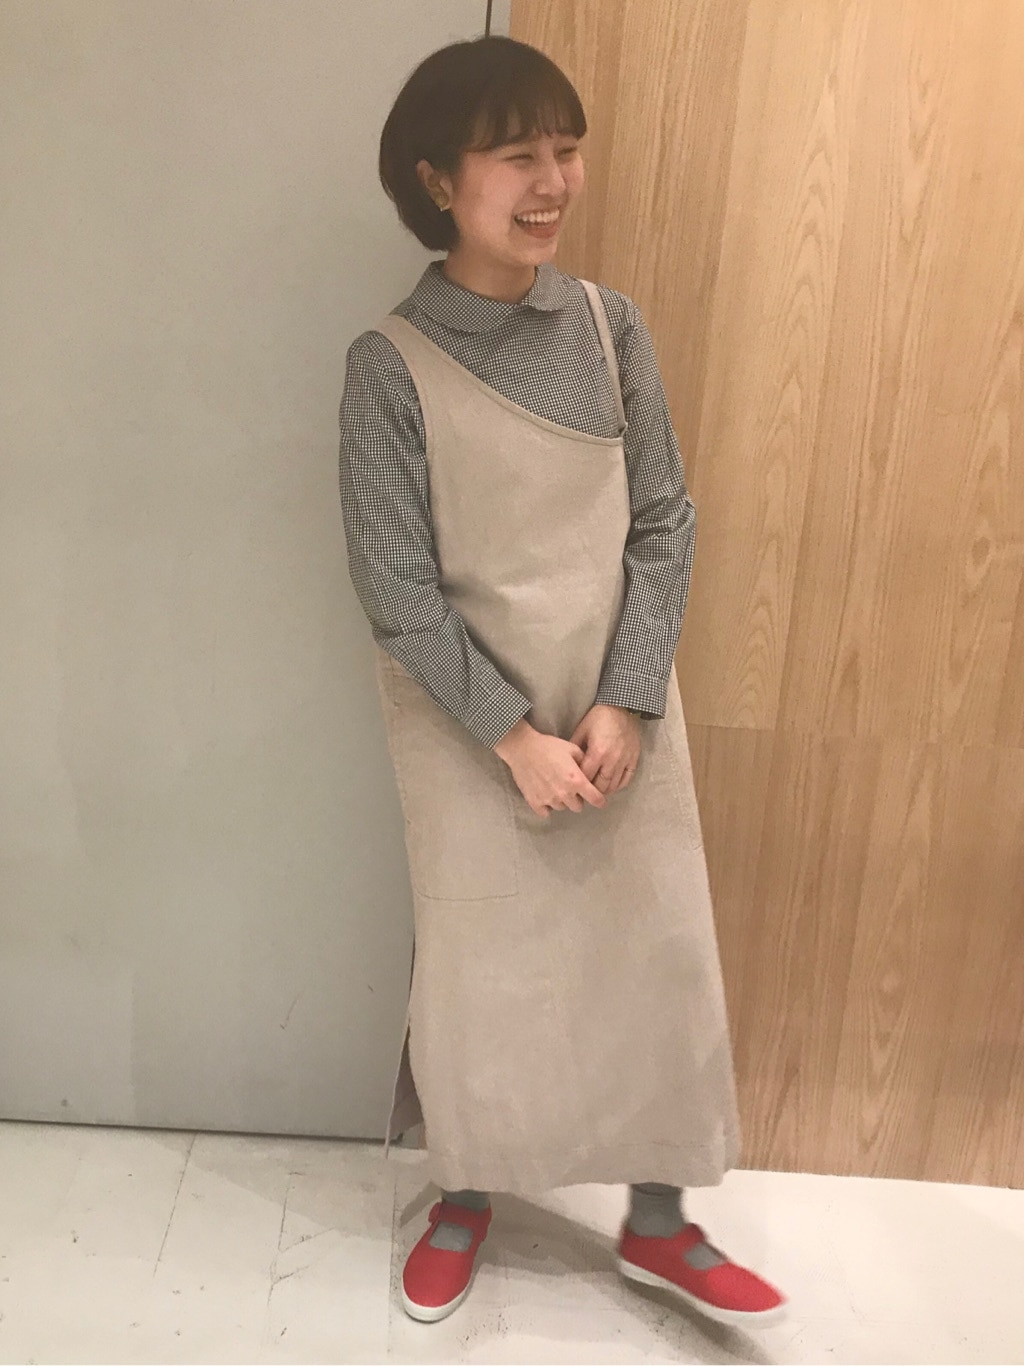 bulle de savon なんばシティ 身長:149cm 2020.03.19